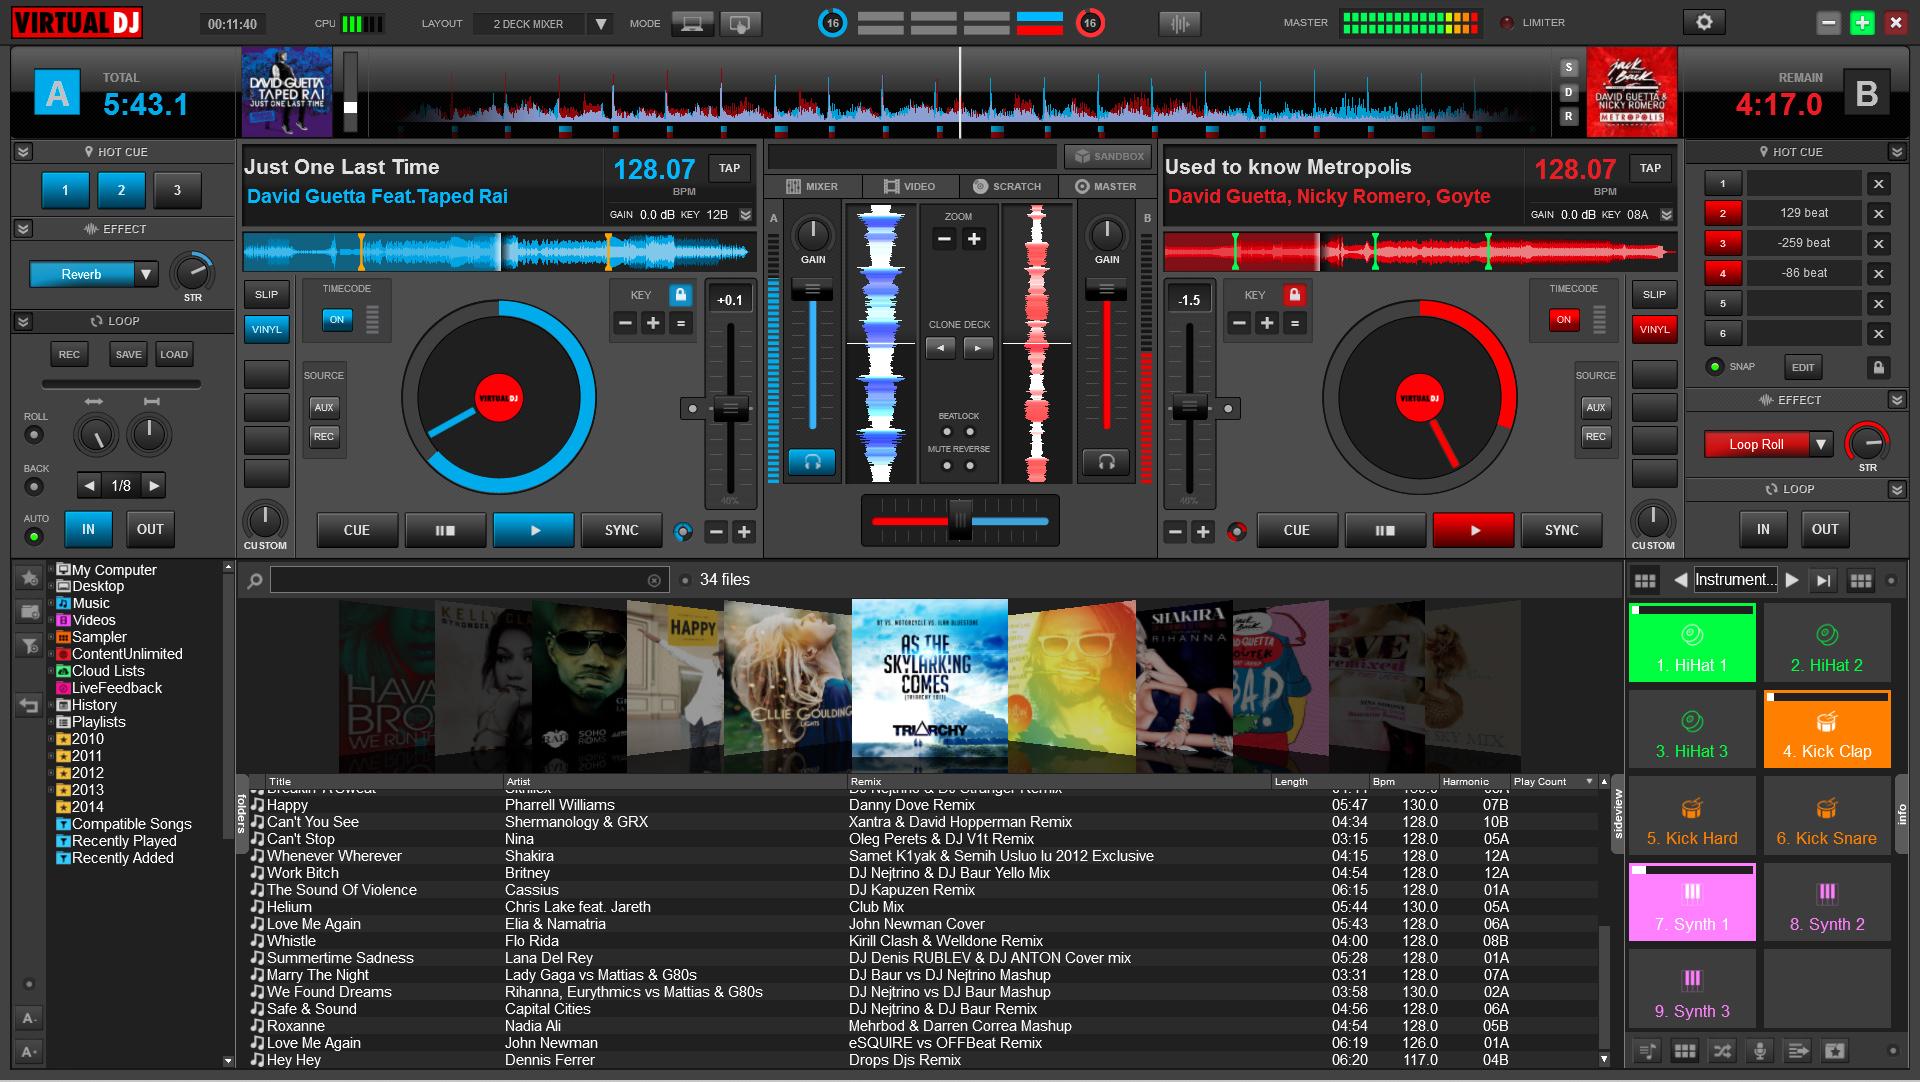 virtual dj home free clubic